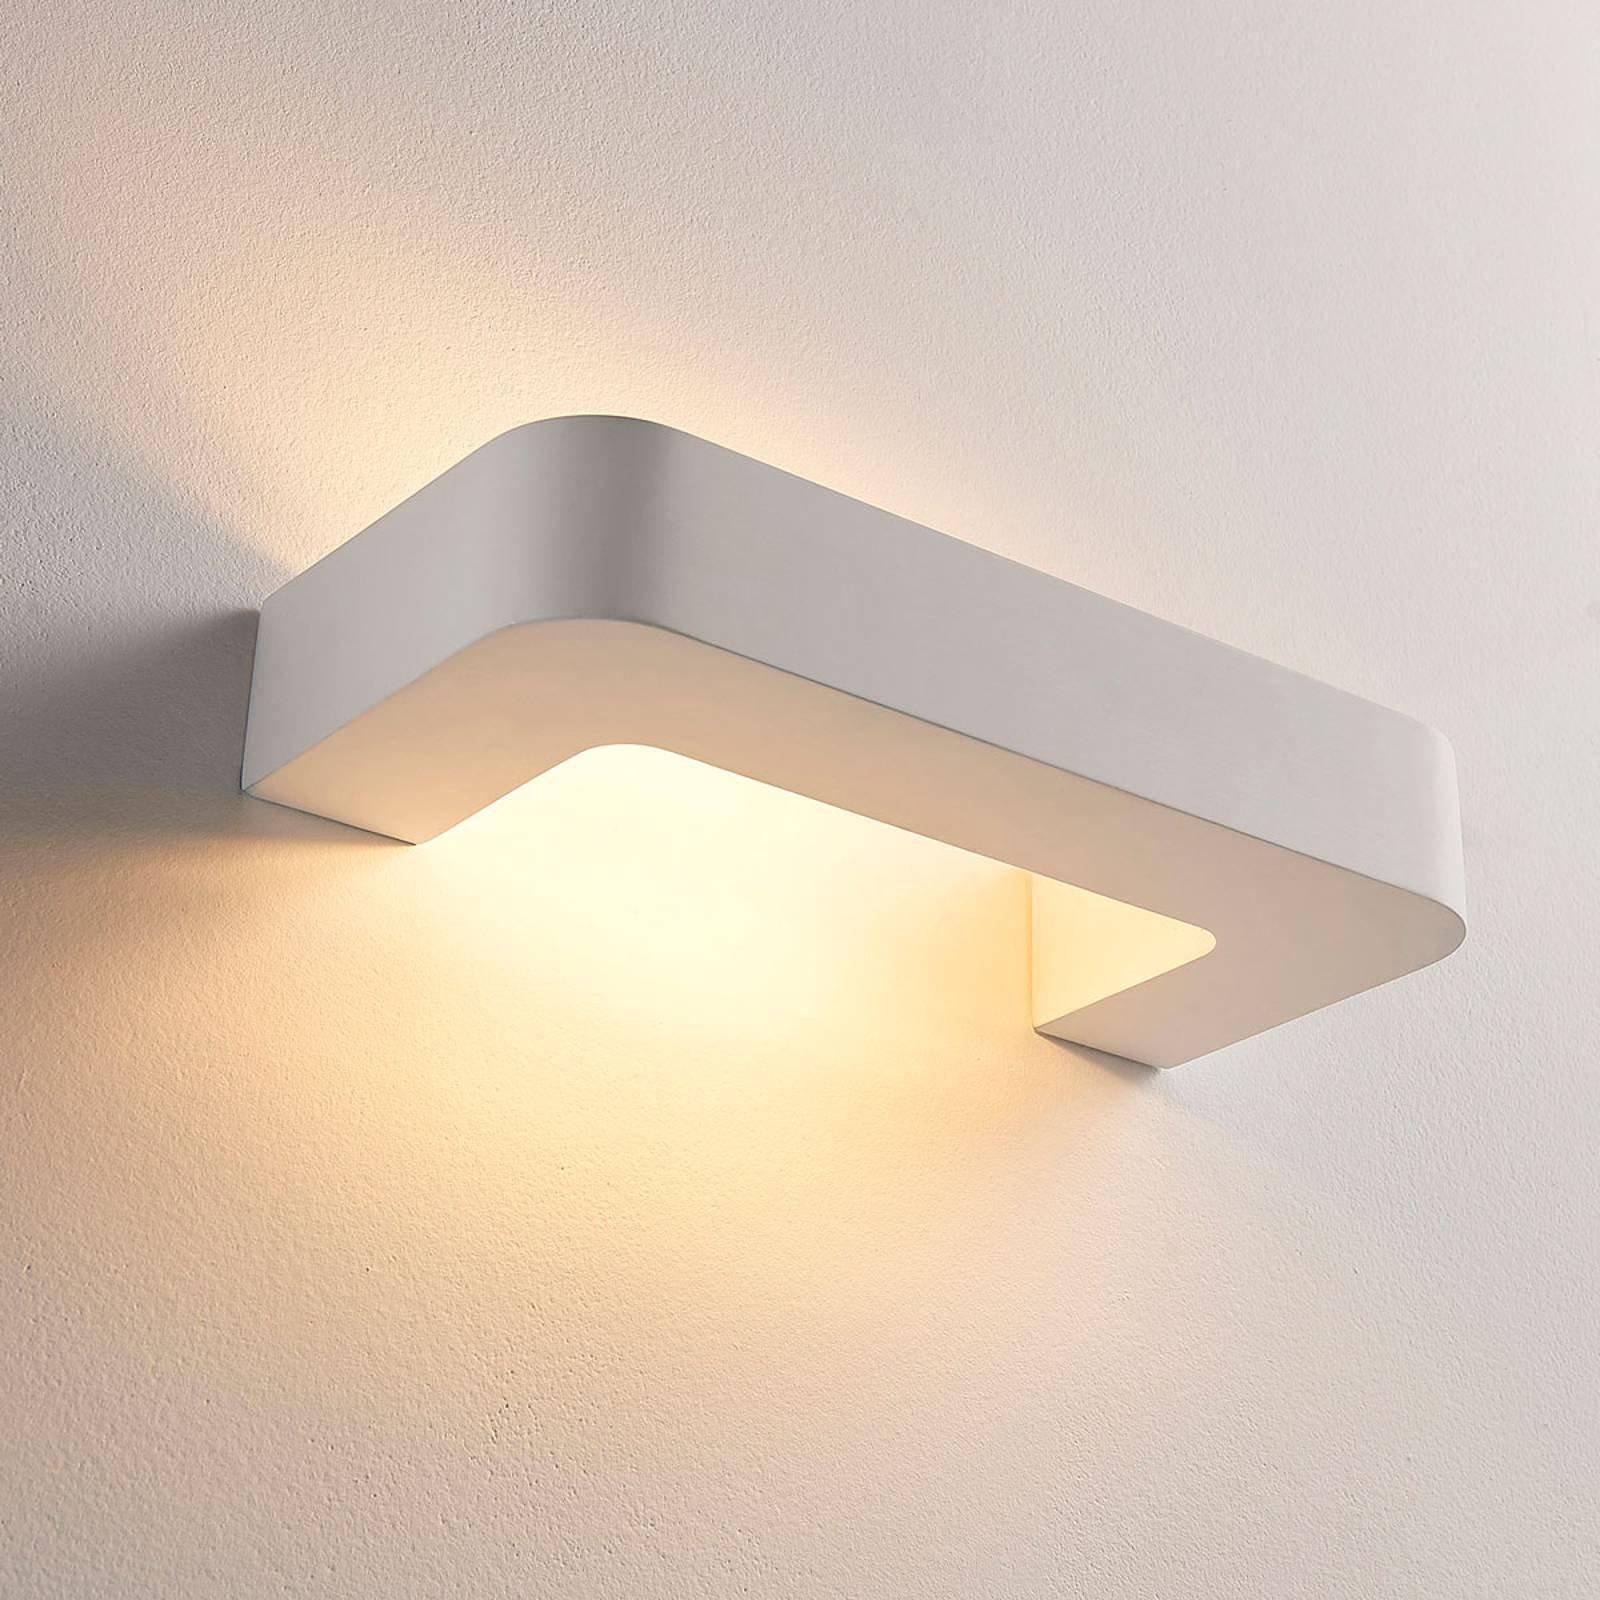 Bøyleformet LED-vegglampe Julika, hvit gips